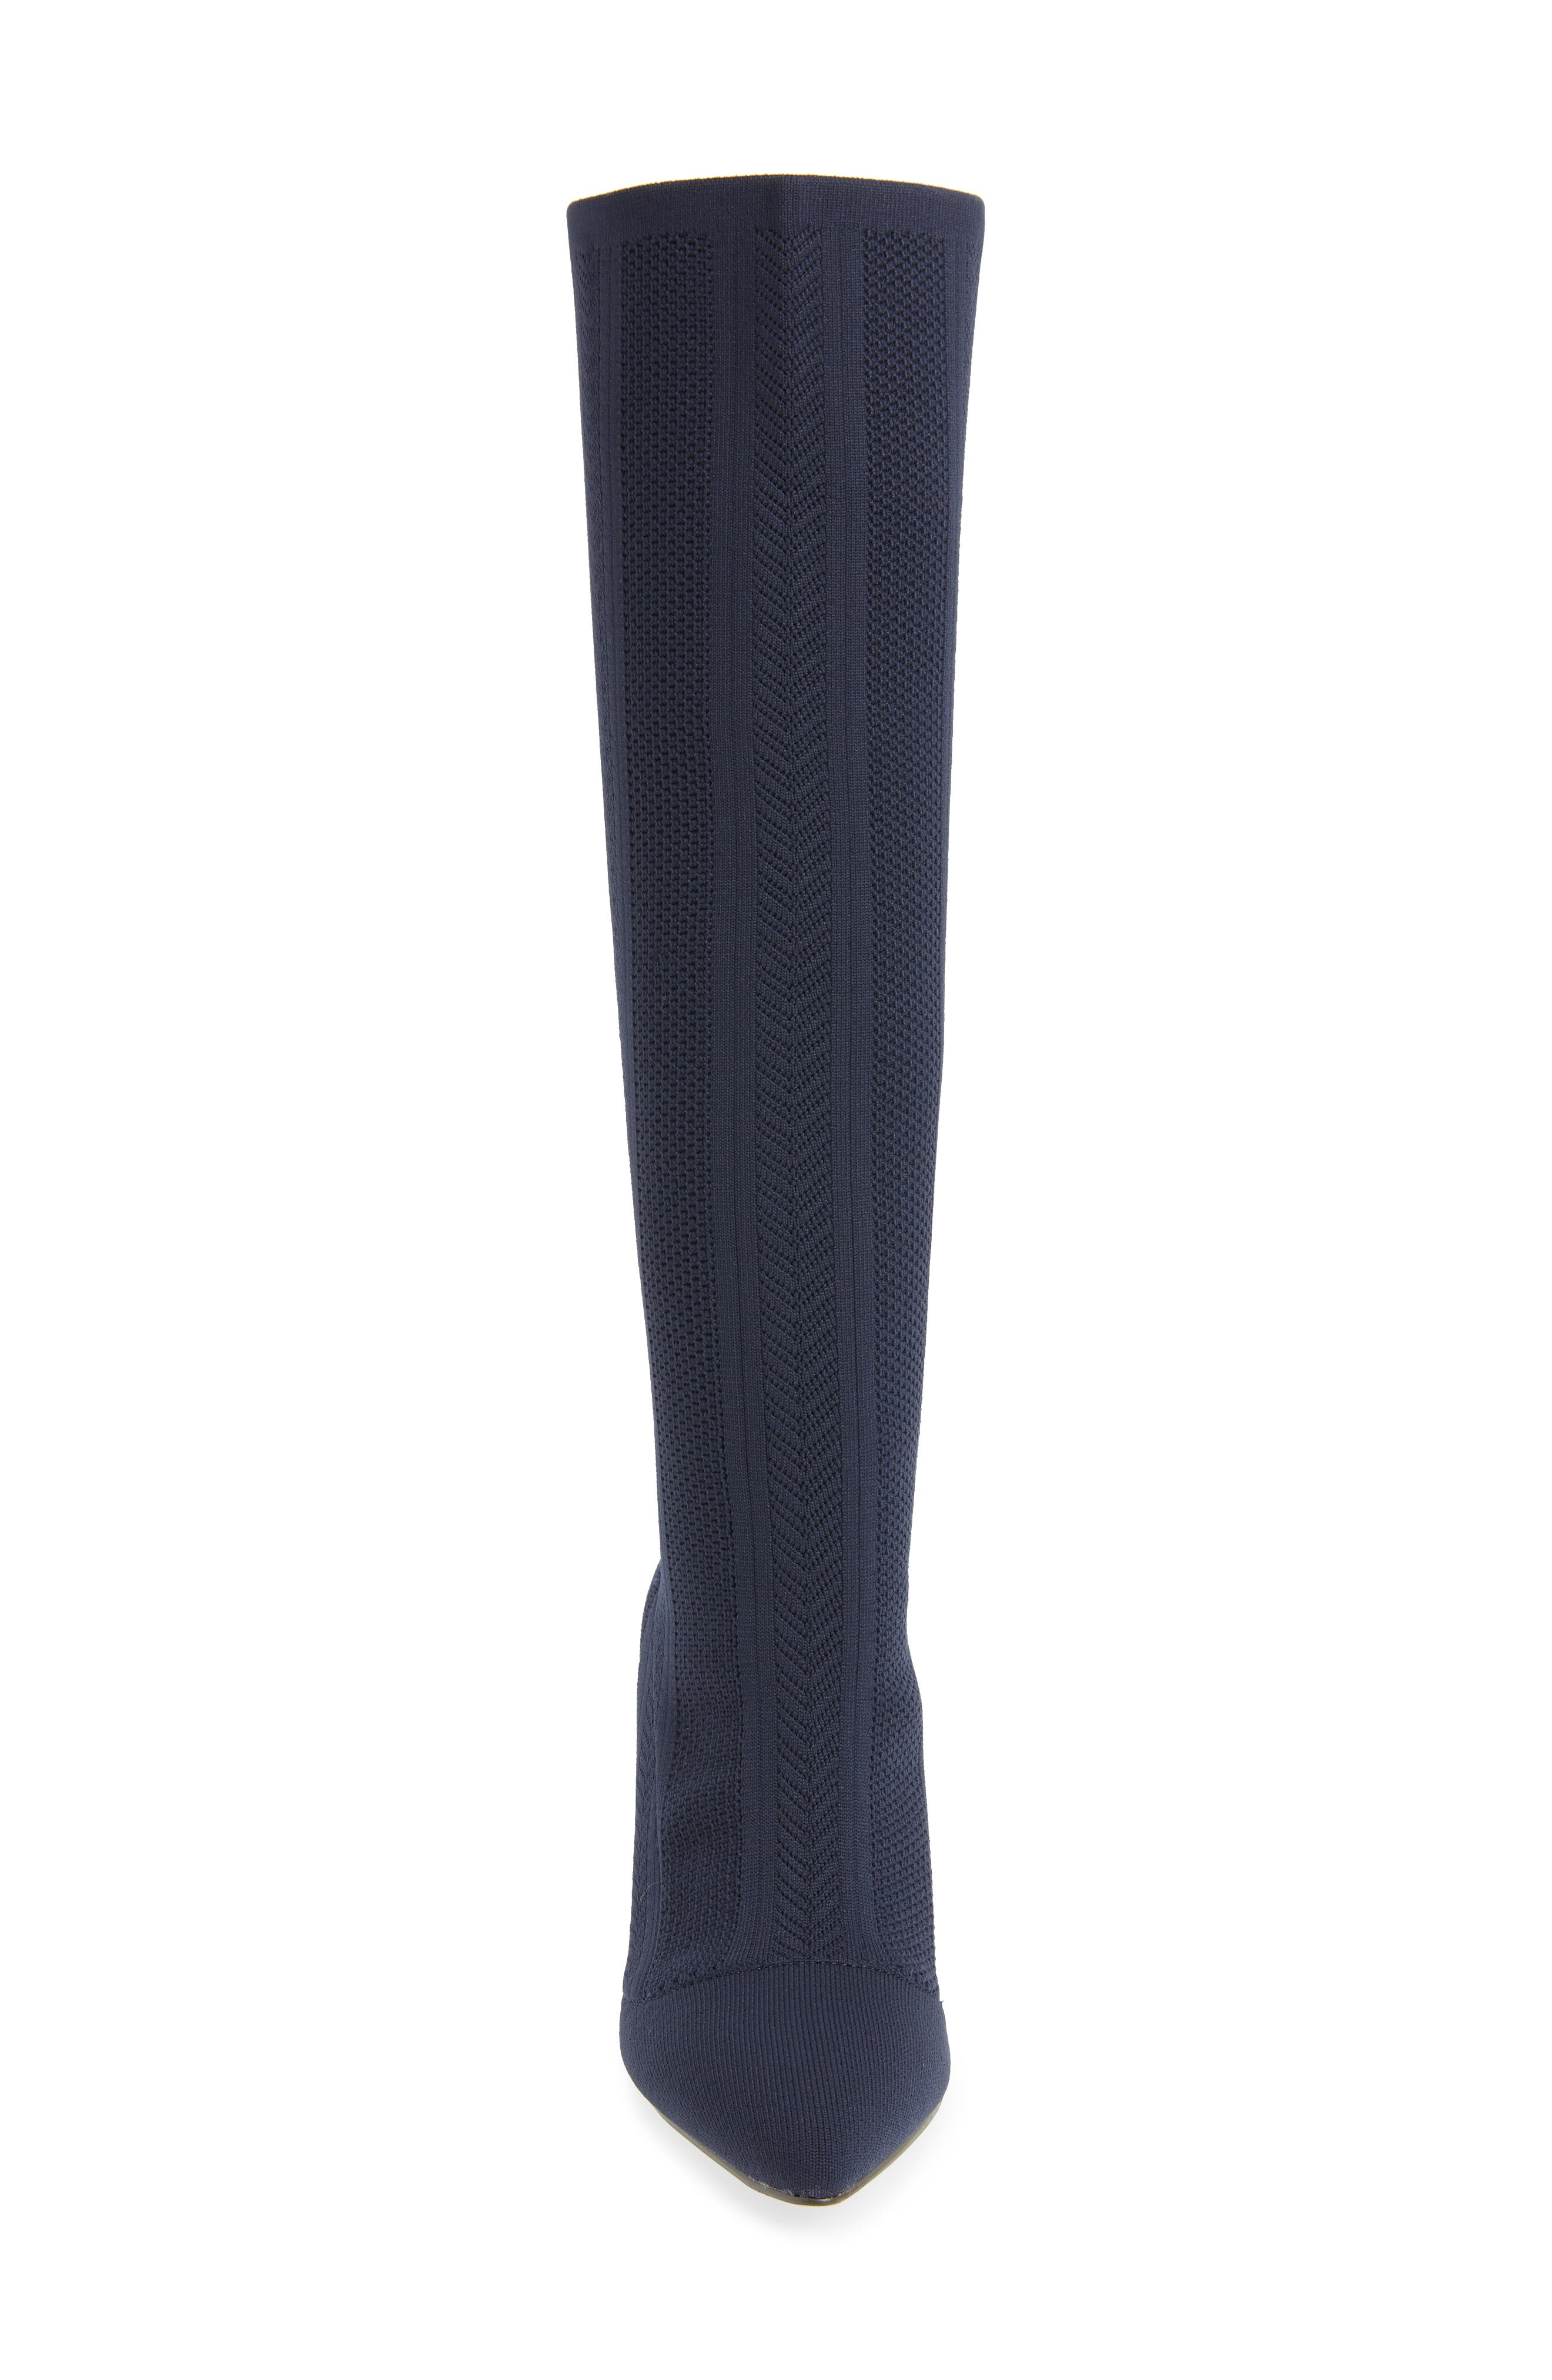 Davis Knit Boot,                             Alternate thumbnail 4, color,                             DEEP NAVY FABRIC